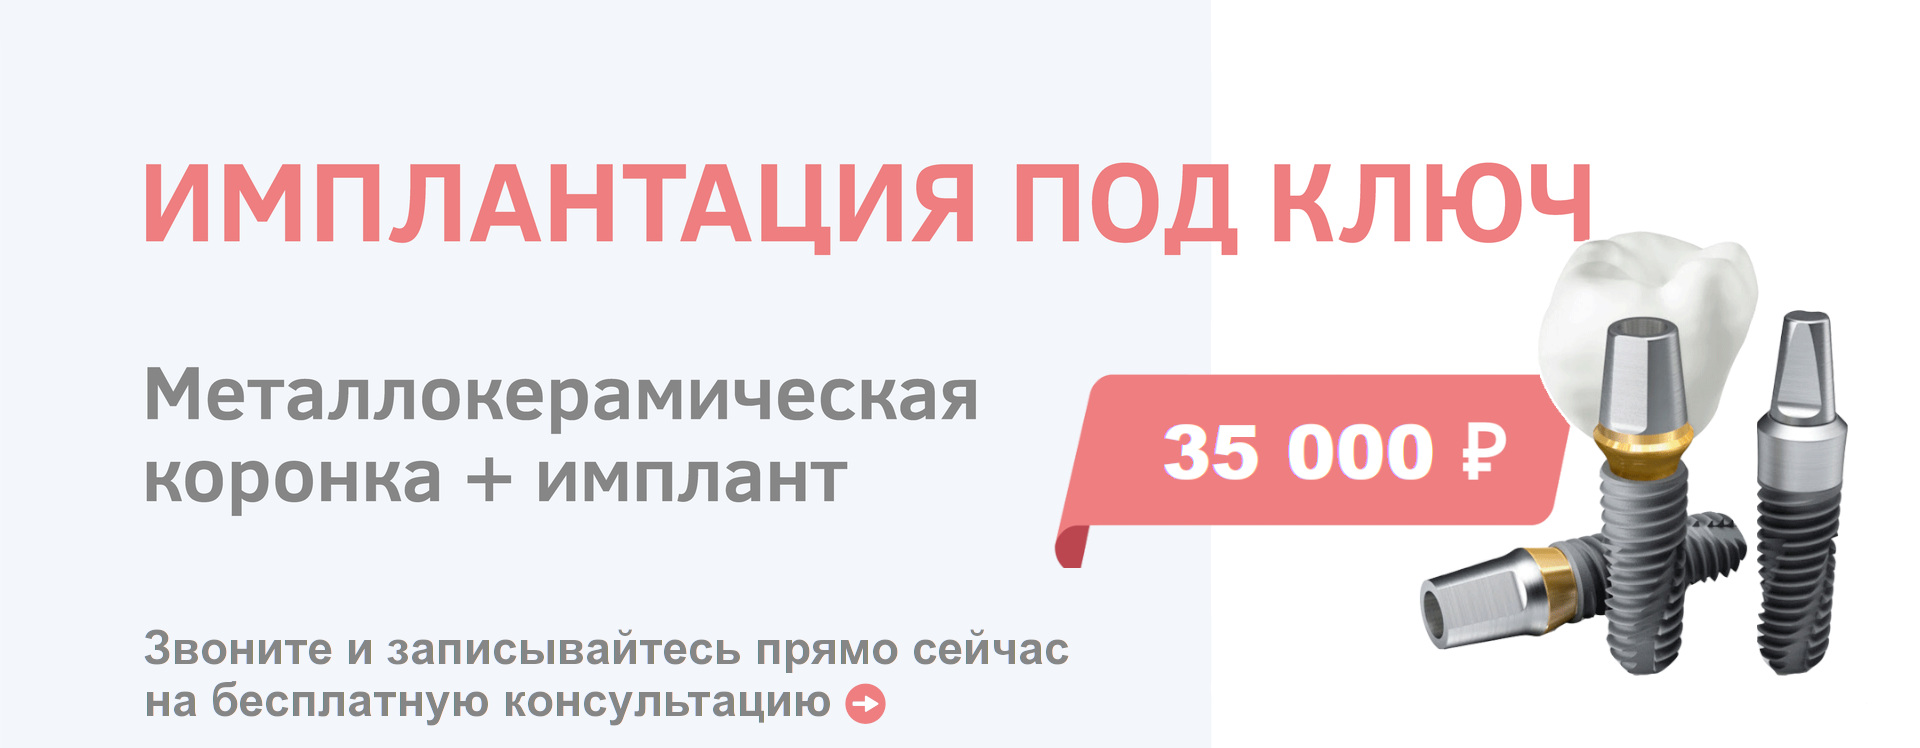 Имплантация под ключ Красноярск